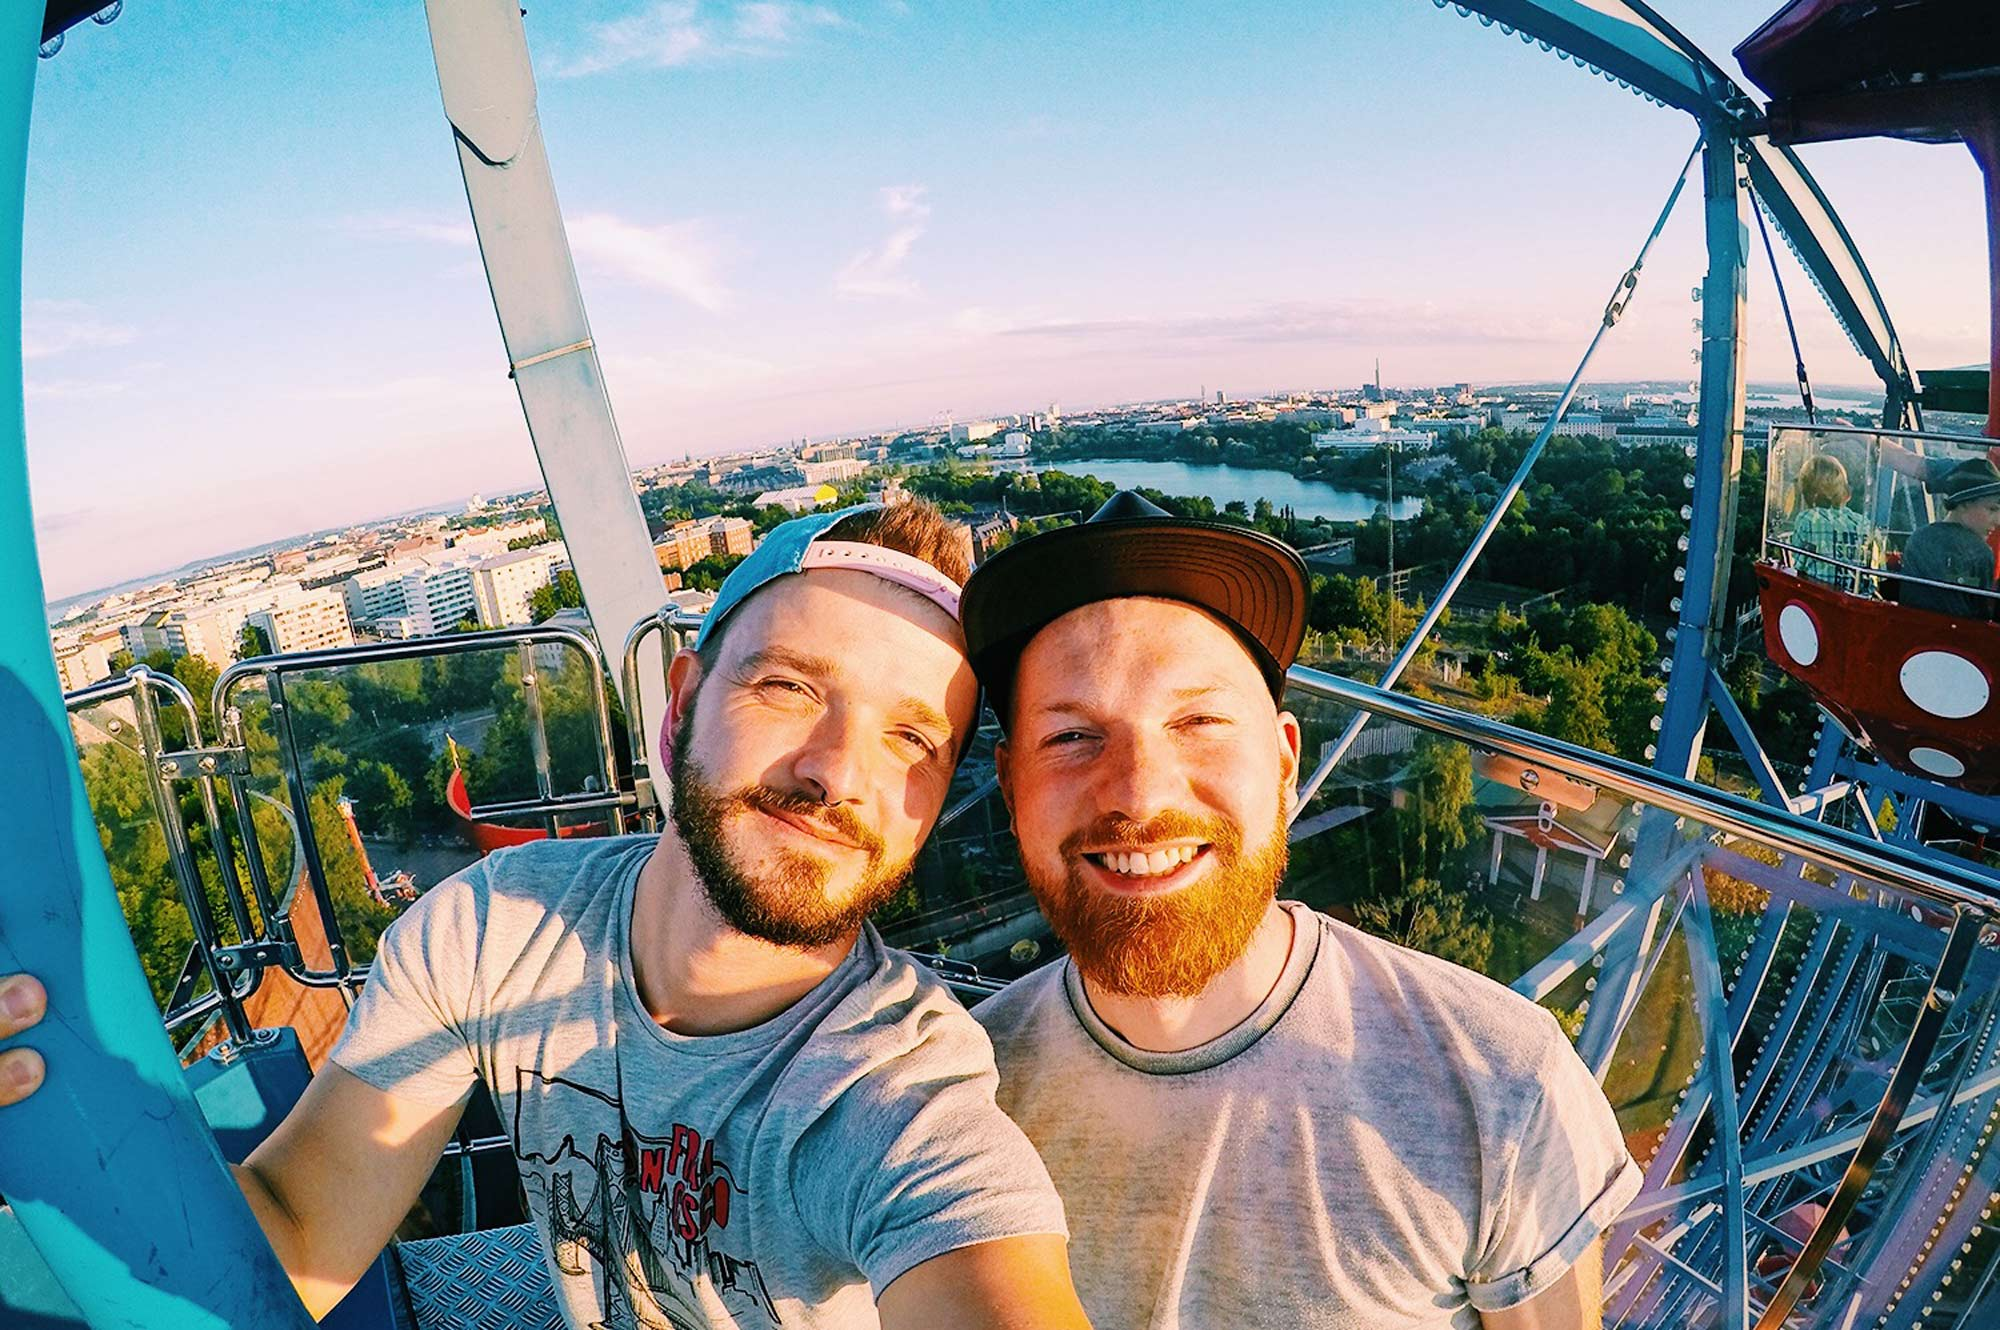 Karl & Daan riding Ferris Wheel | Gay Couple Review Theme Park Linnanmäki Helsinki Finland © CoupleofMen.com